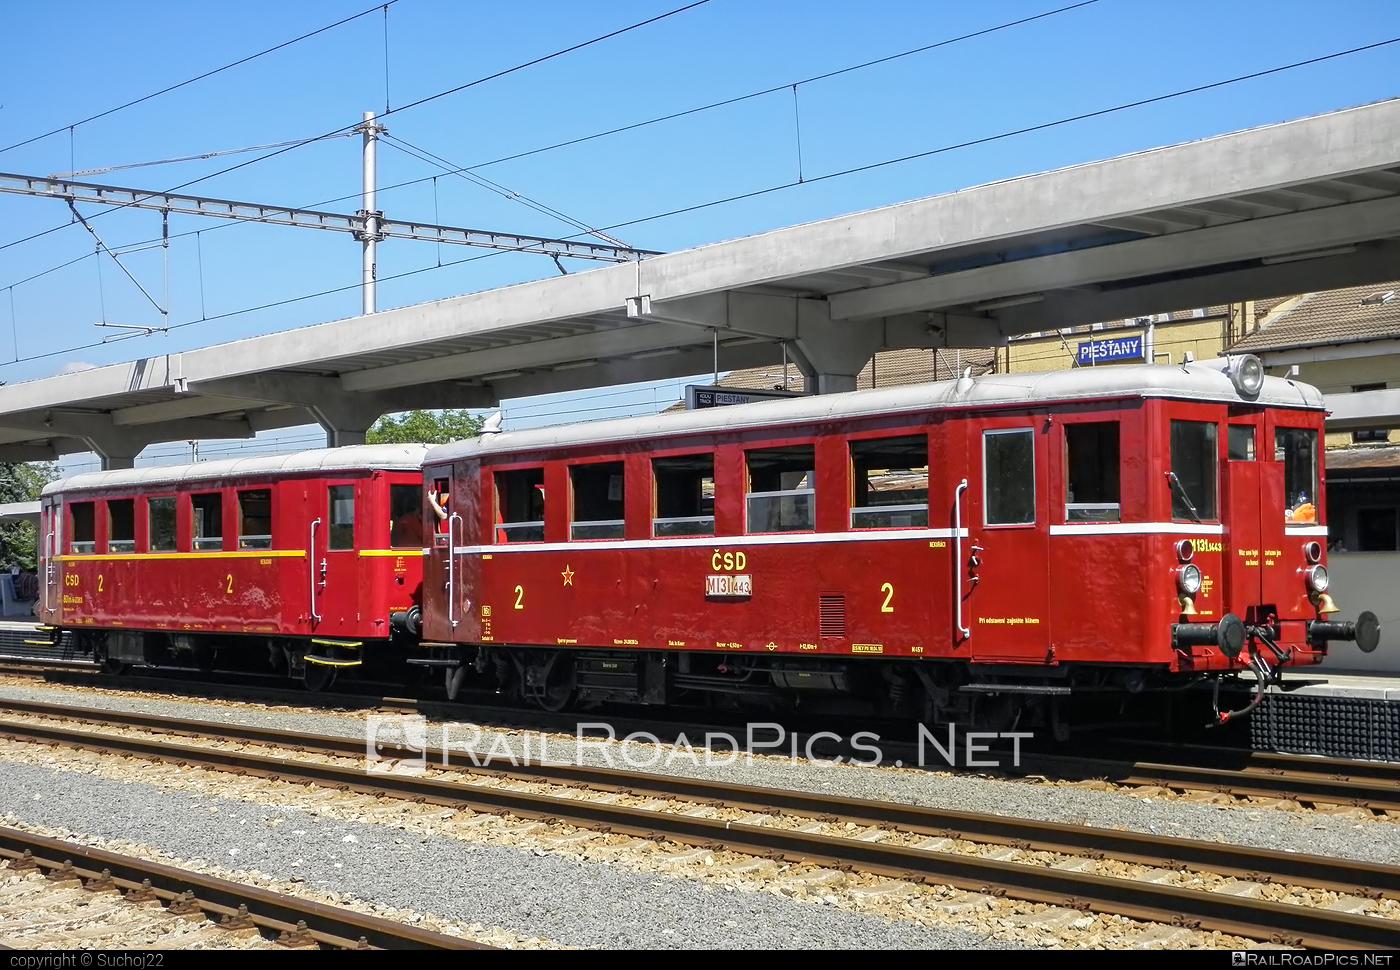 Vagónka TATRA Studénka Class M131.1 - M131.1443 operated by Železnice Slovenskej Republiky #csd #hurvinek #m1311 #tatra #vagonkastudenka #vagonkatatrastudenka #zelezniceslovenskejrepubliky #zsr